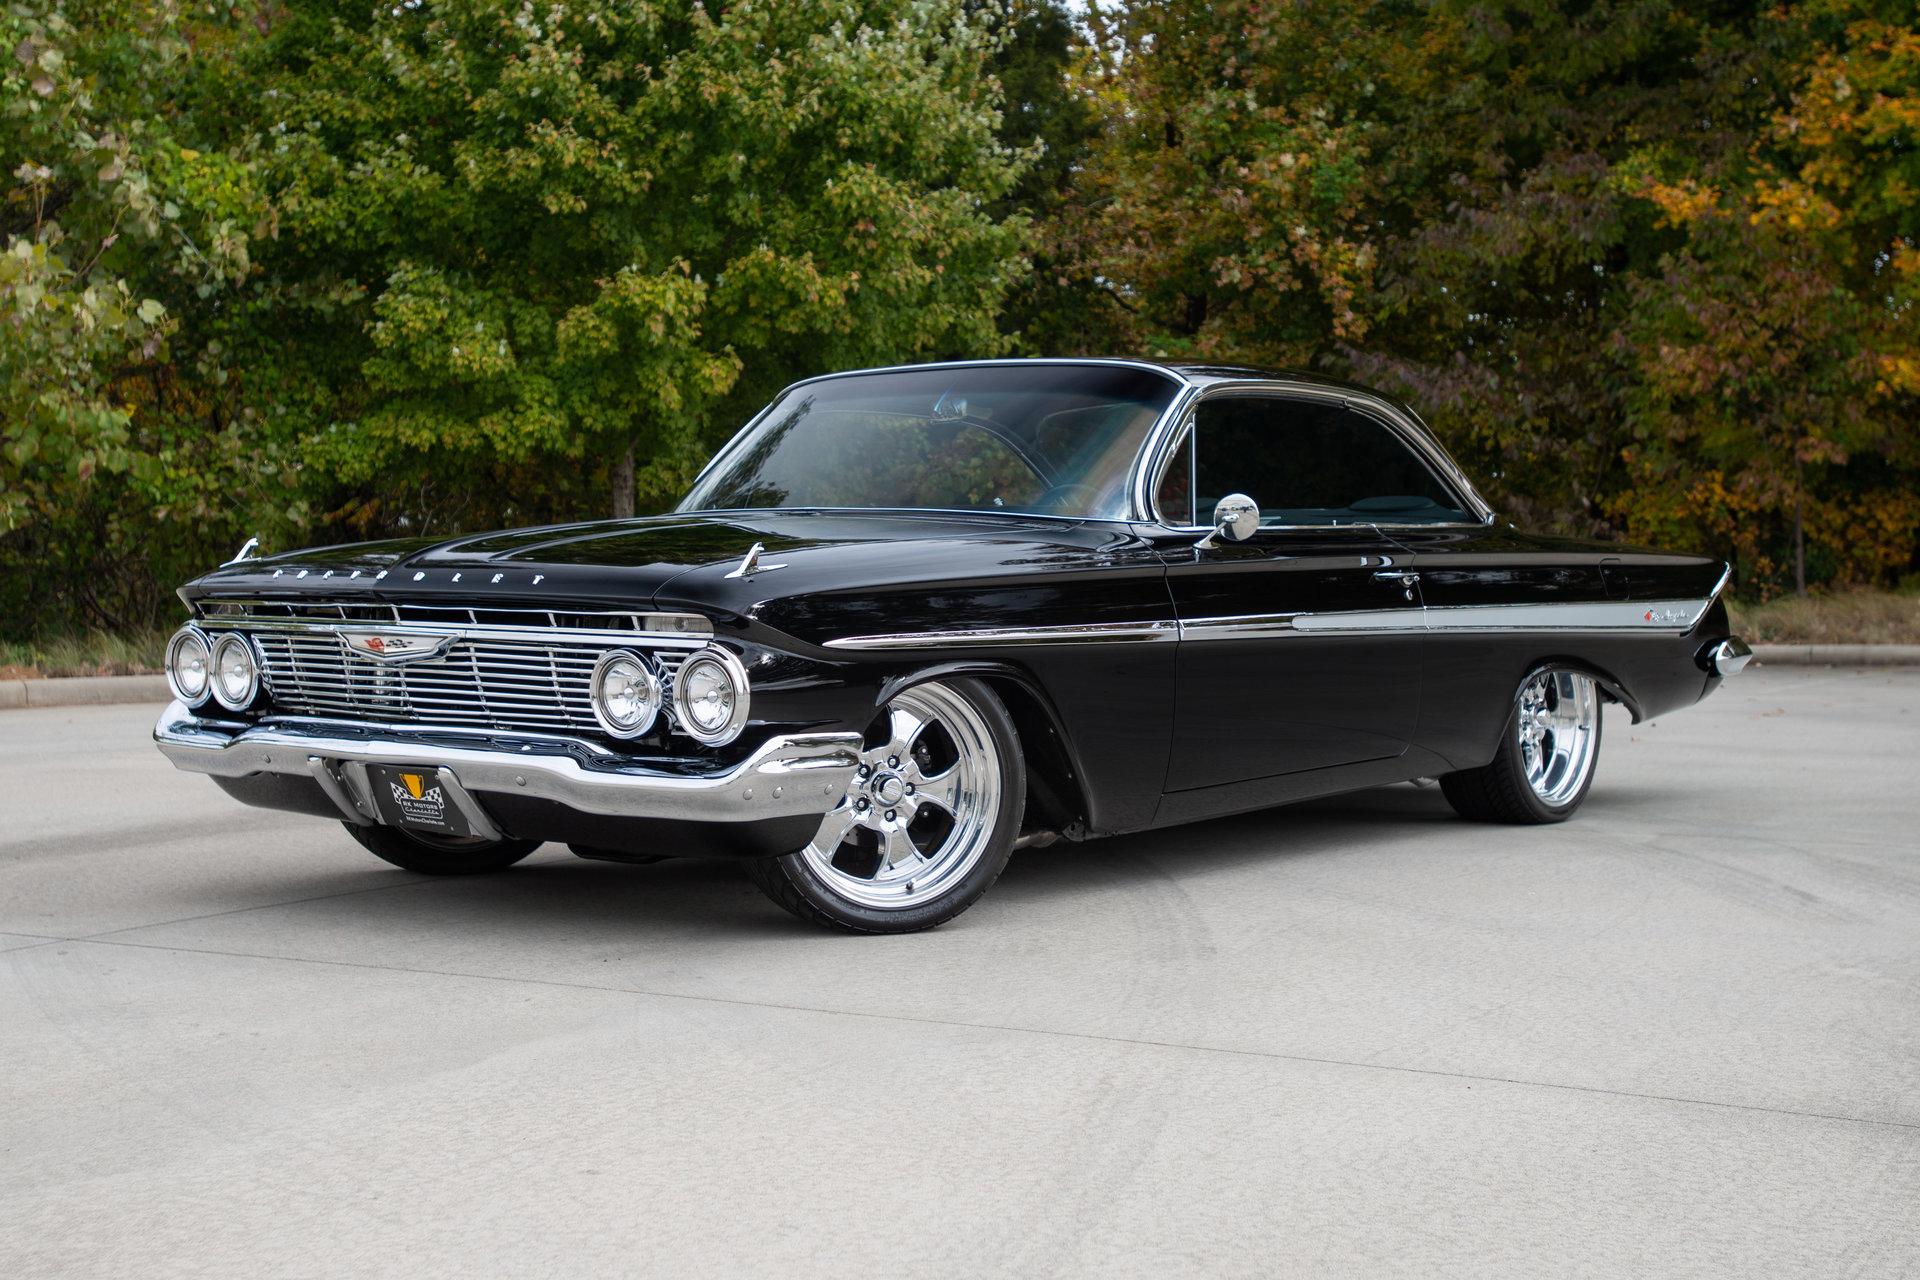 136332 1961 Chevrolet Impala Rk Motors Classic Cars For Sale Bubble Top